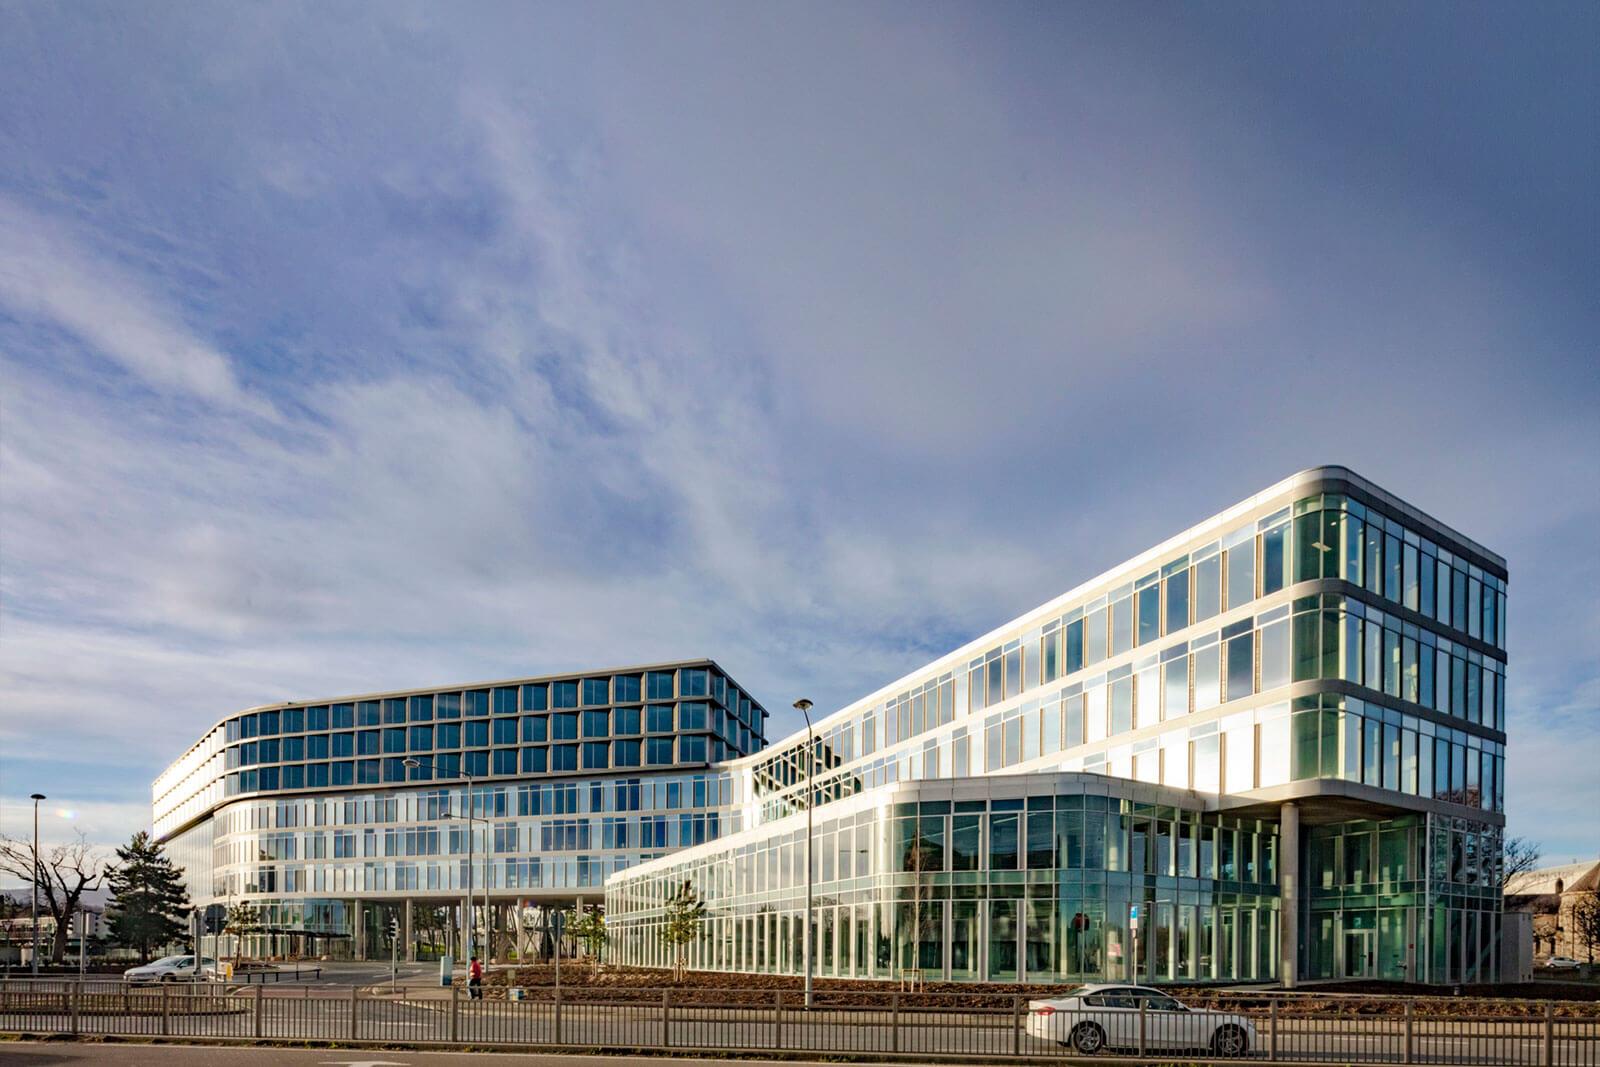 The Seamark Building Dublin Exterior Day